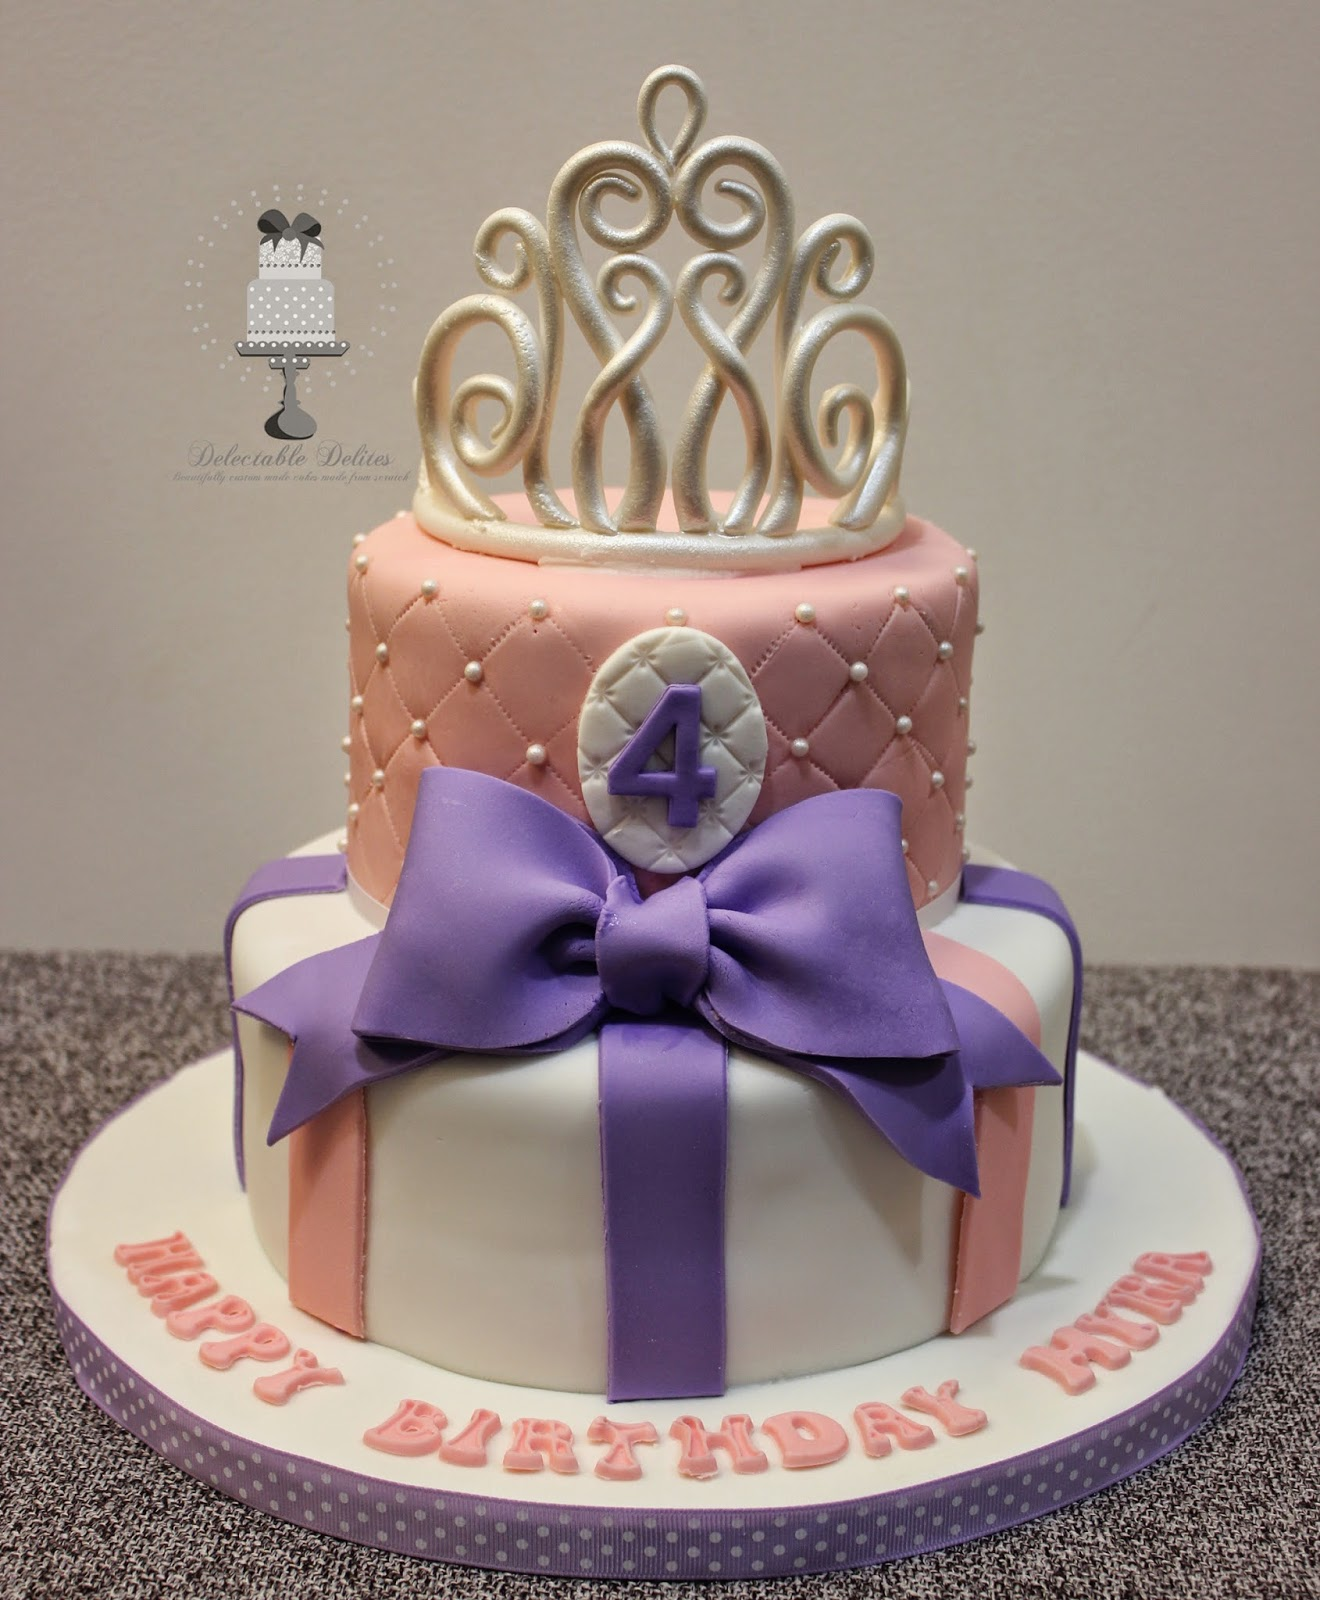 Delectable Delites Princess Tiara Cake For Myra S 4th